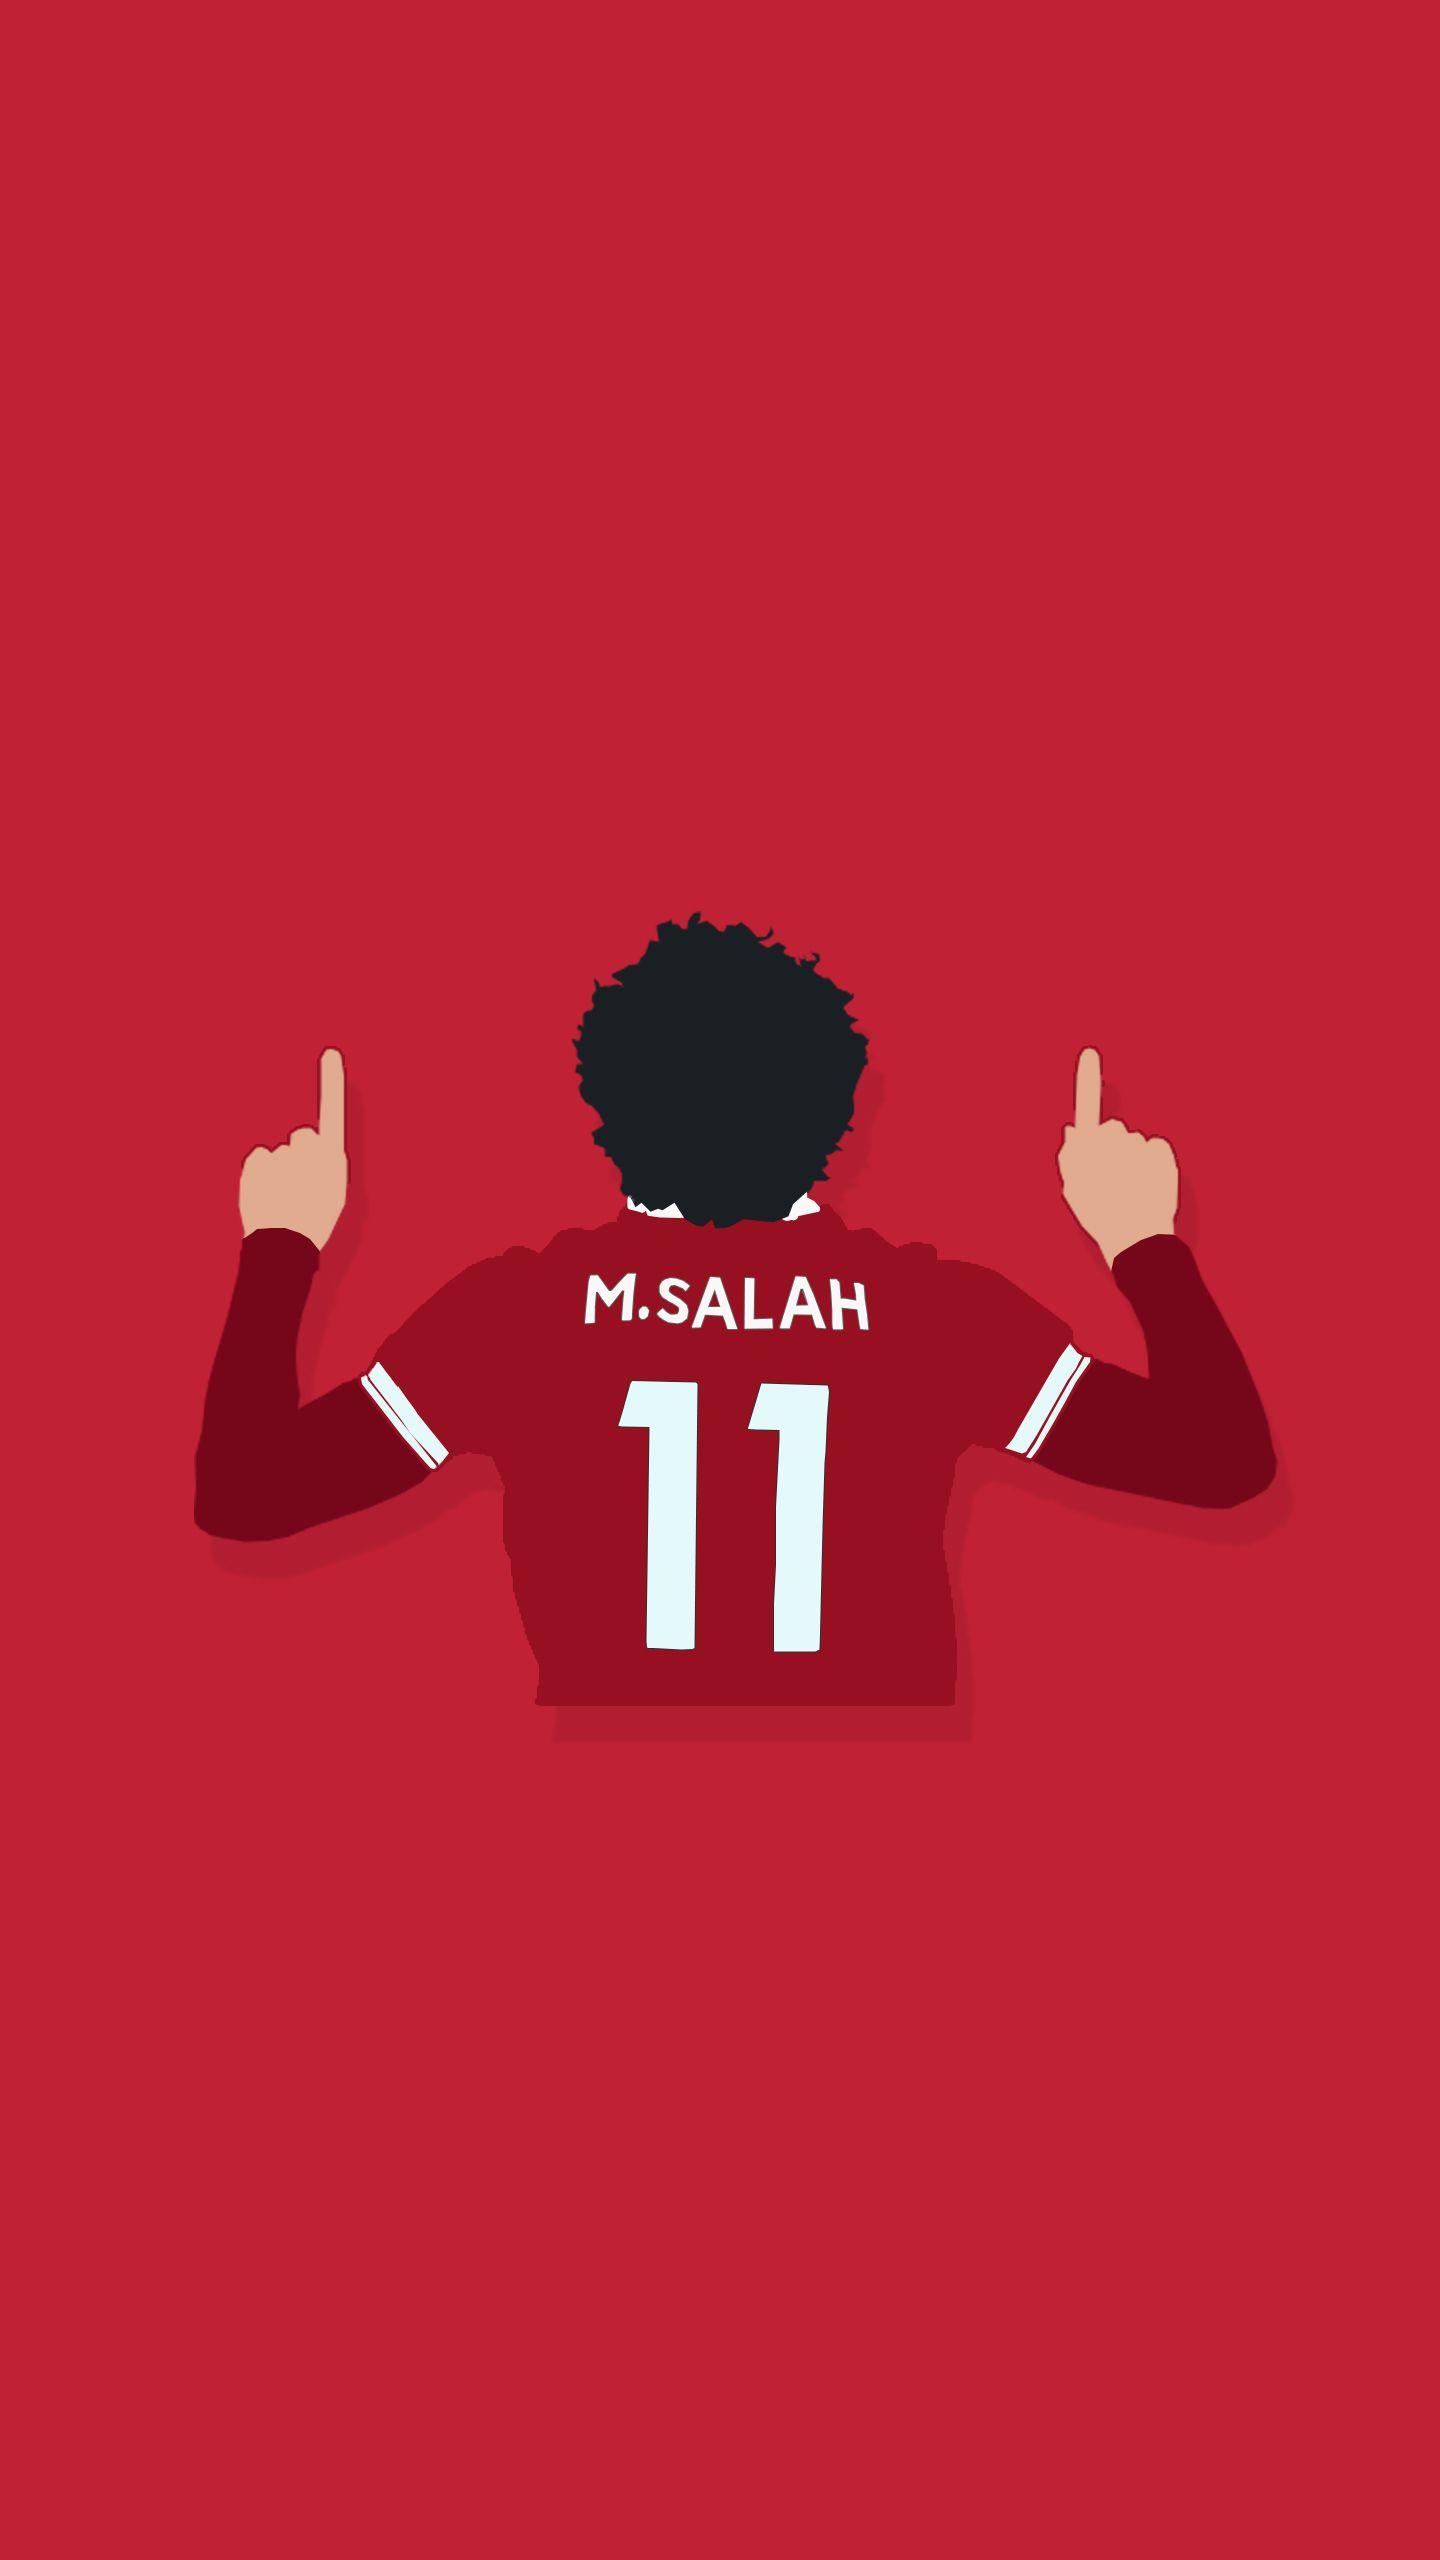 Mo' Salah mohammedsalah mosalah graphicdesigner